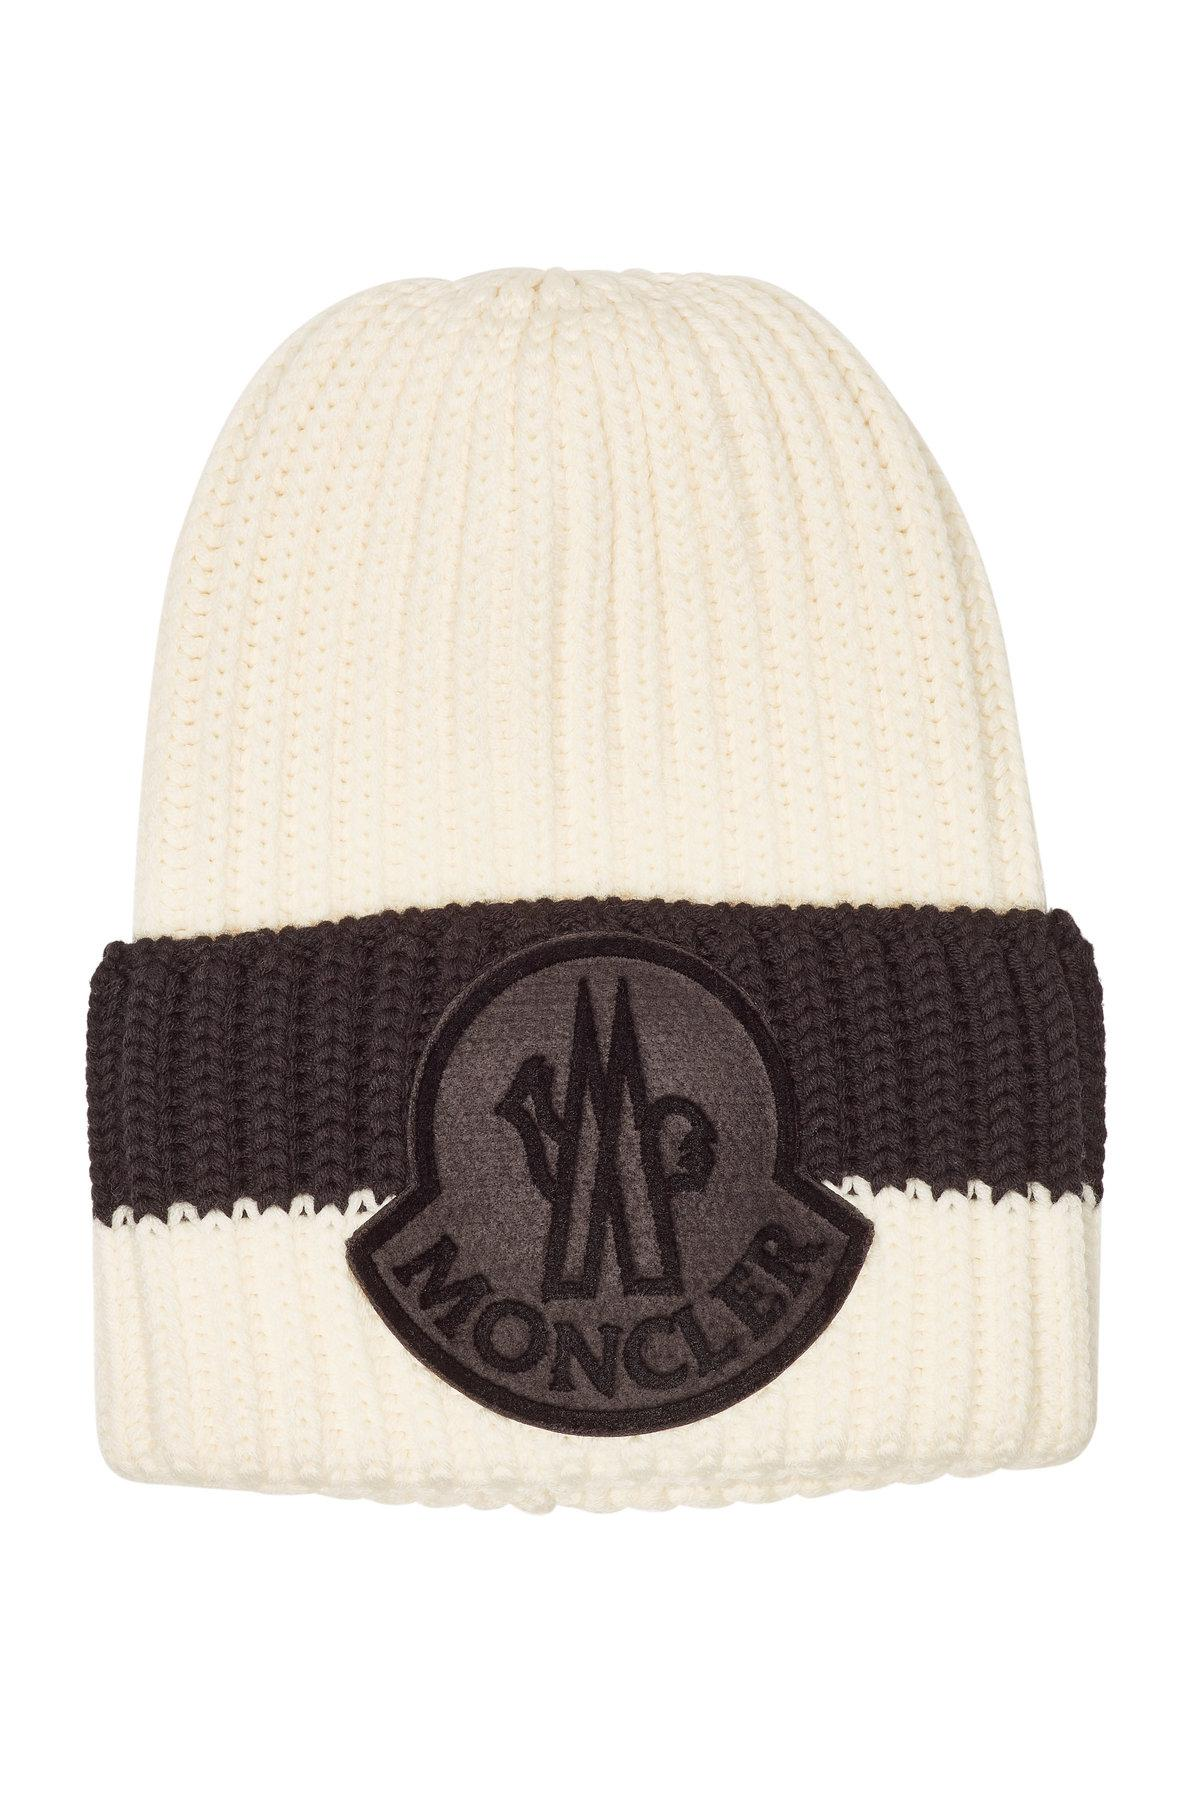 03c646ea96d Moncler Virgin Wool Hat in Brown for Men - Lyst